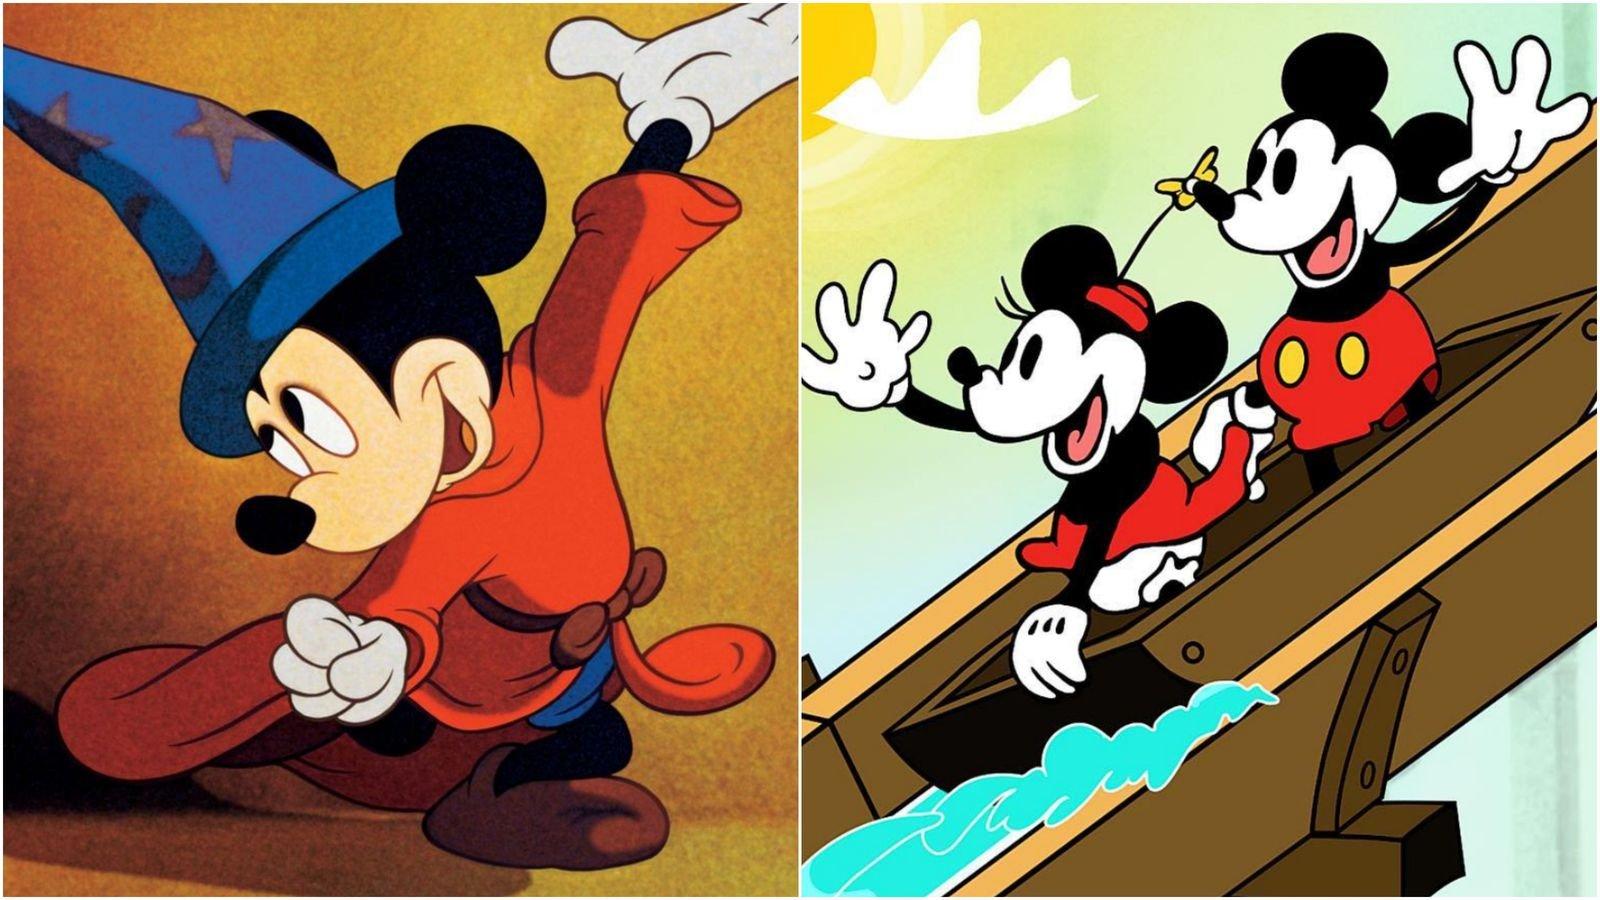 img 5bd8e2255a26c.png?resize=412,232 - 【米奇90週年】關於迪士尼米老鼠的10個秘密:他原本是隻兔子,跟米妮竟然是「這個」關係!